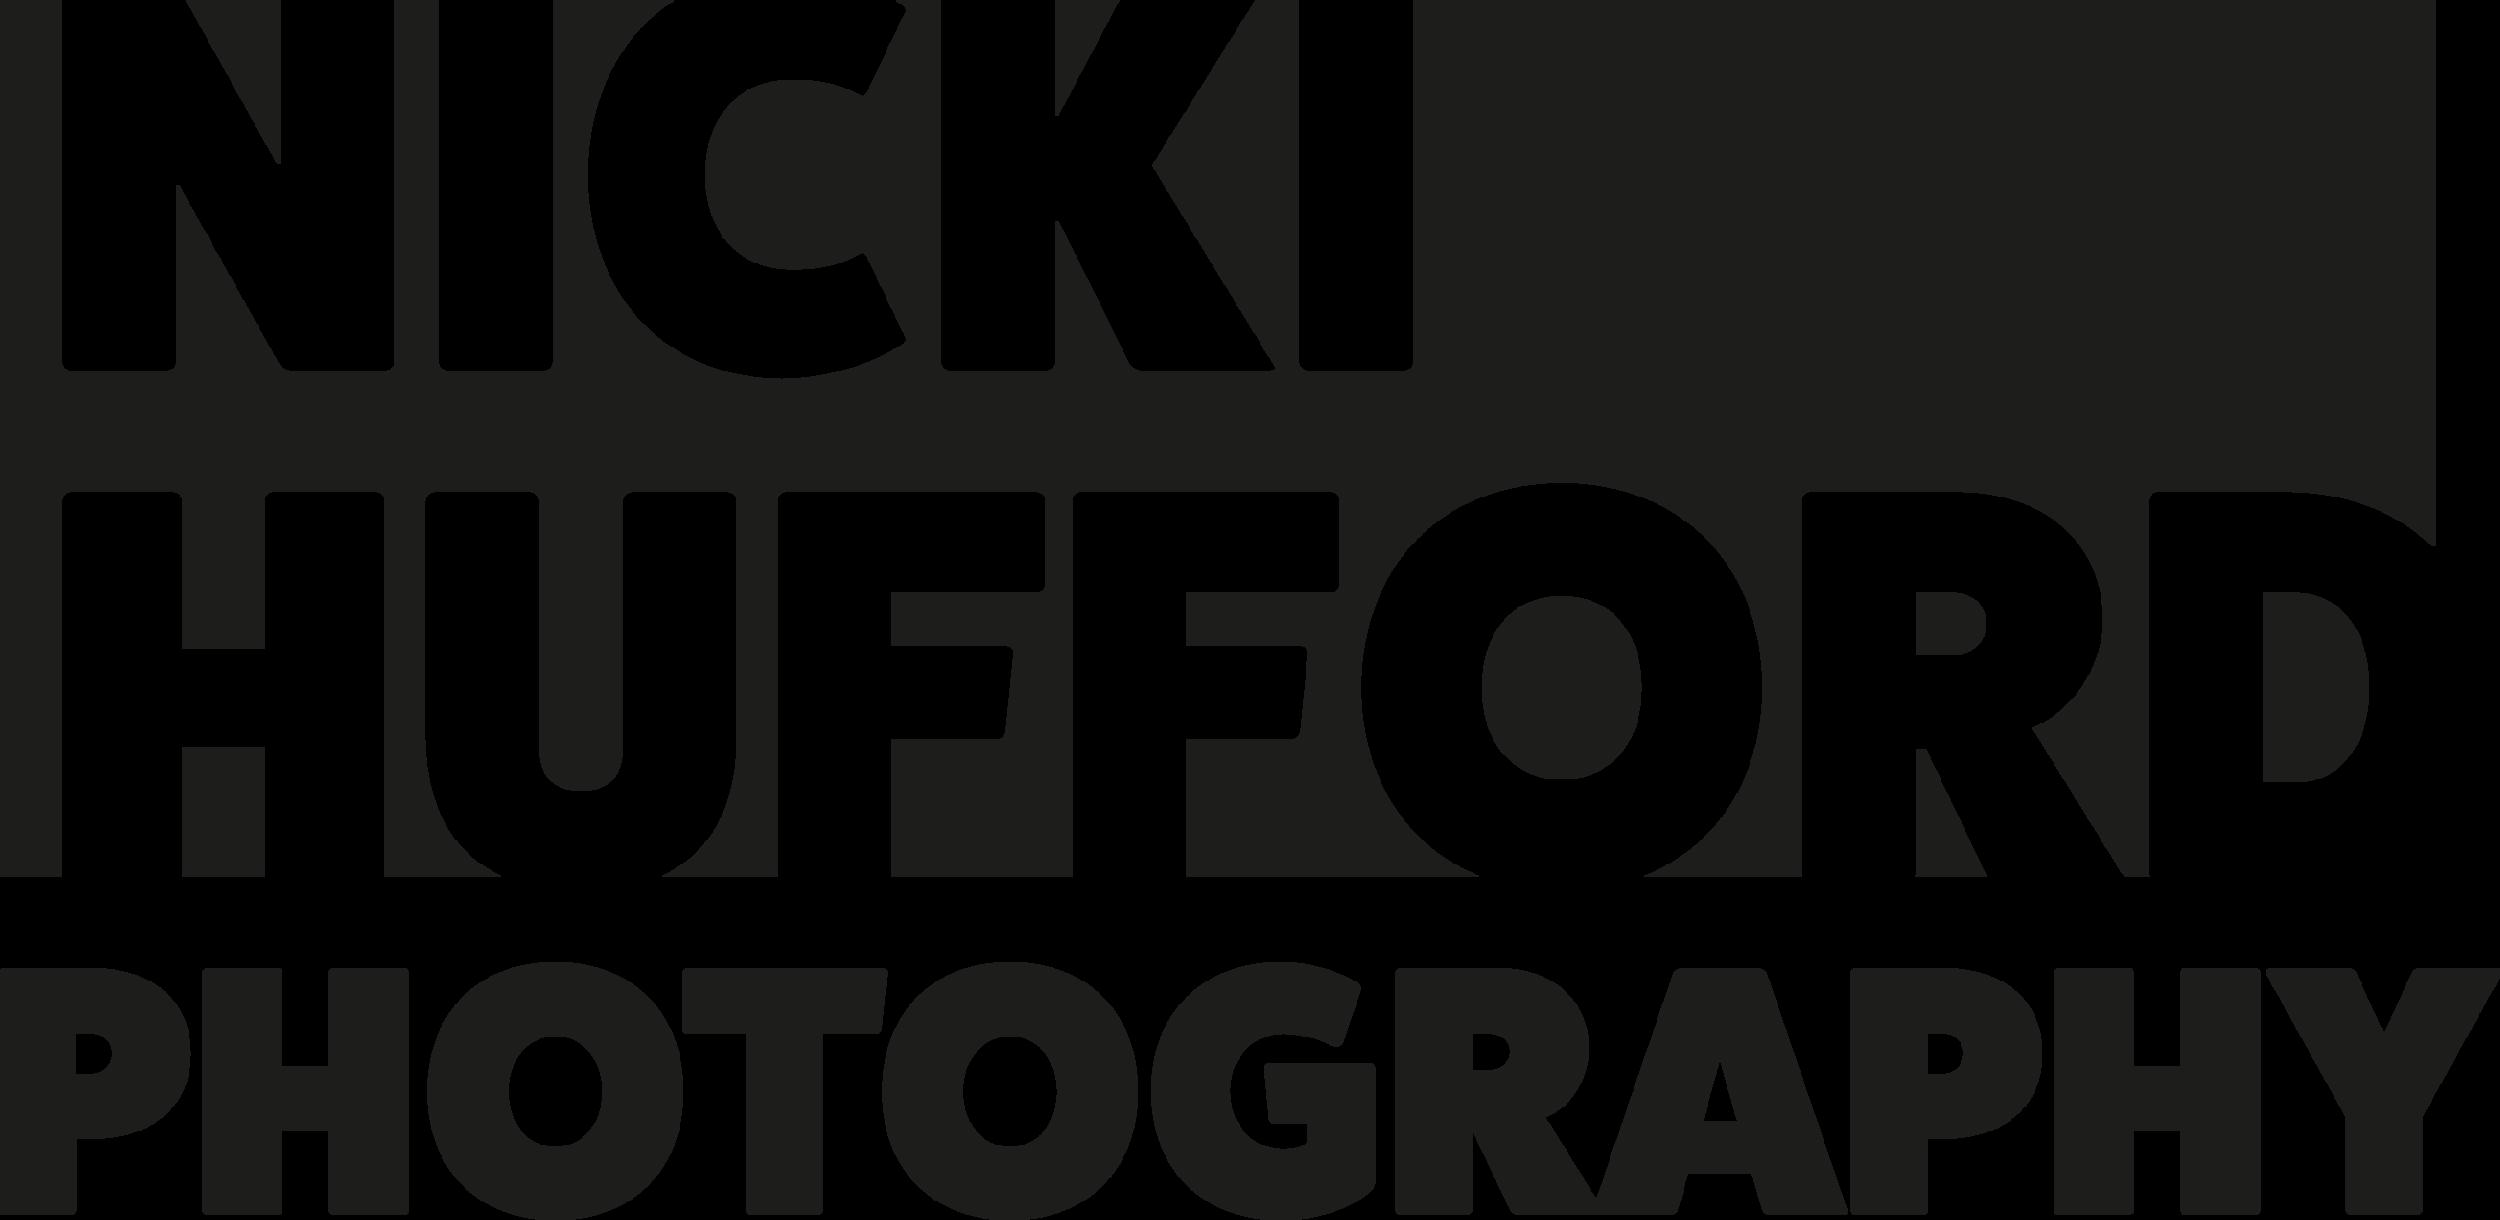 Nicki hufford masterbrand black no background cmyk